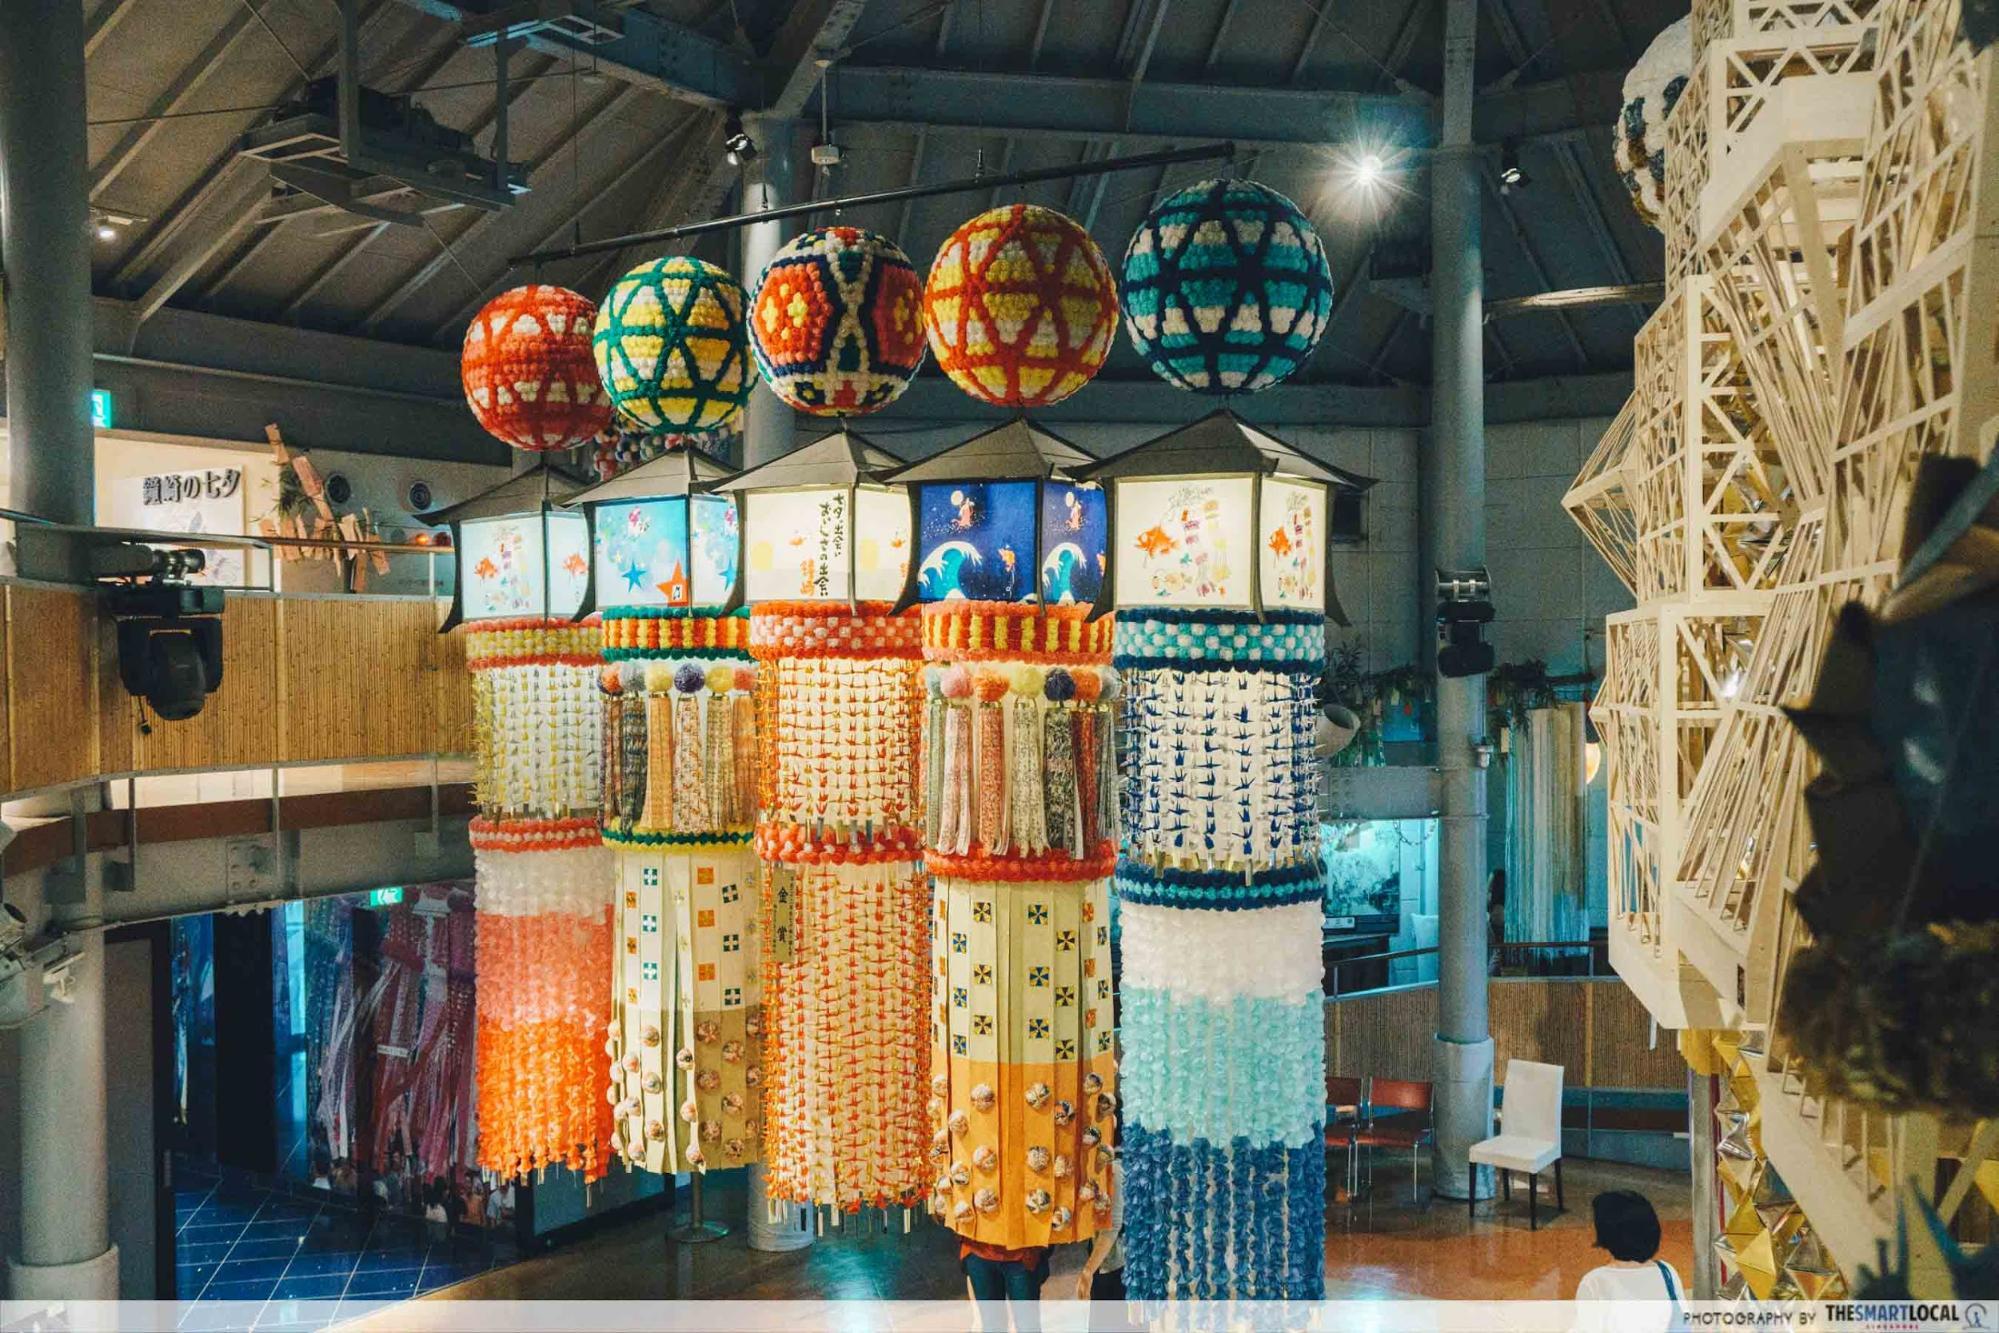 Tohoku Japan - Sendai Tanabata Museum lantern